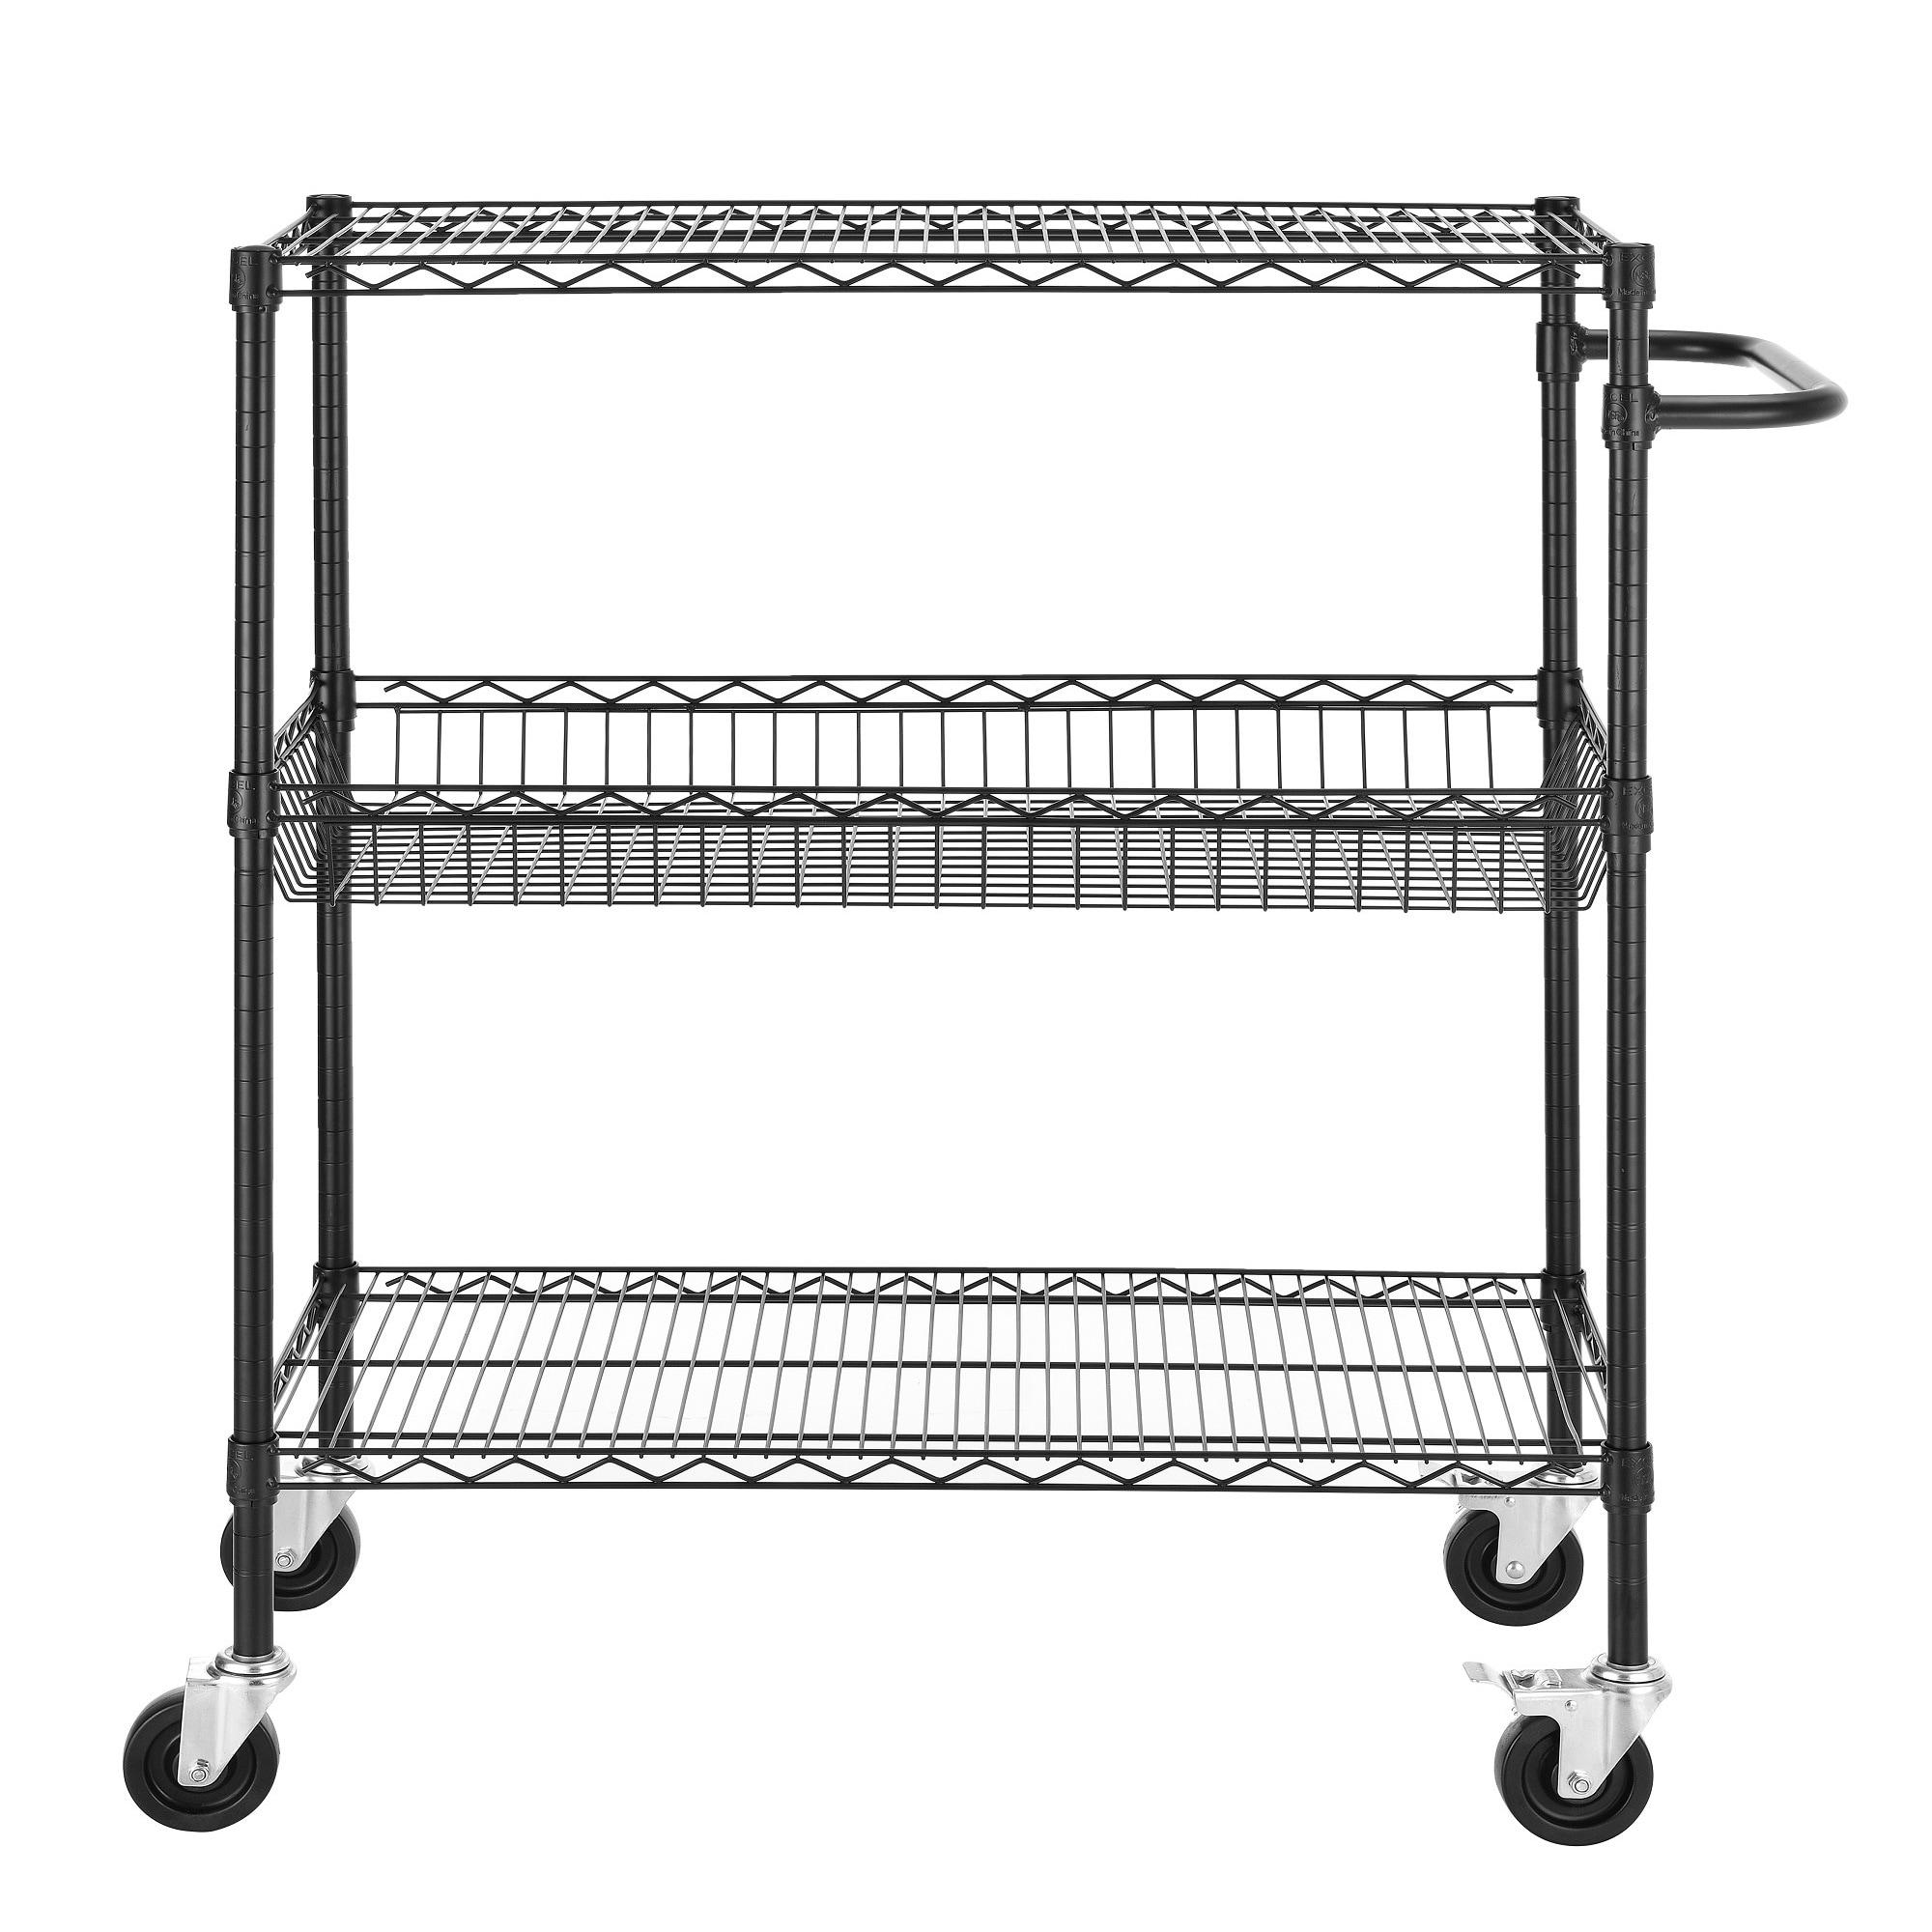 45-inch Heavy Duty Commercial Grade Black Wire Shelving Cart - Free ...